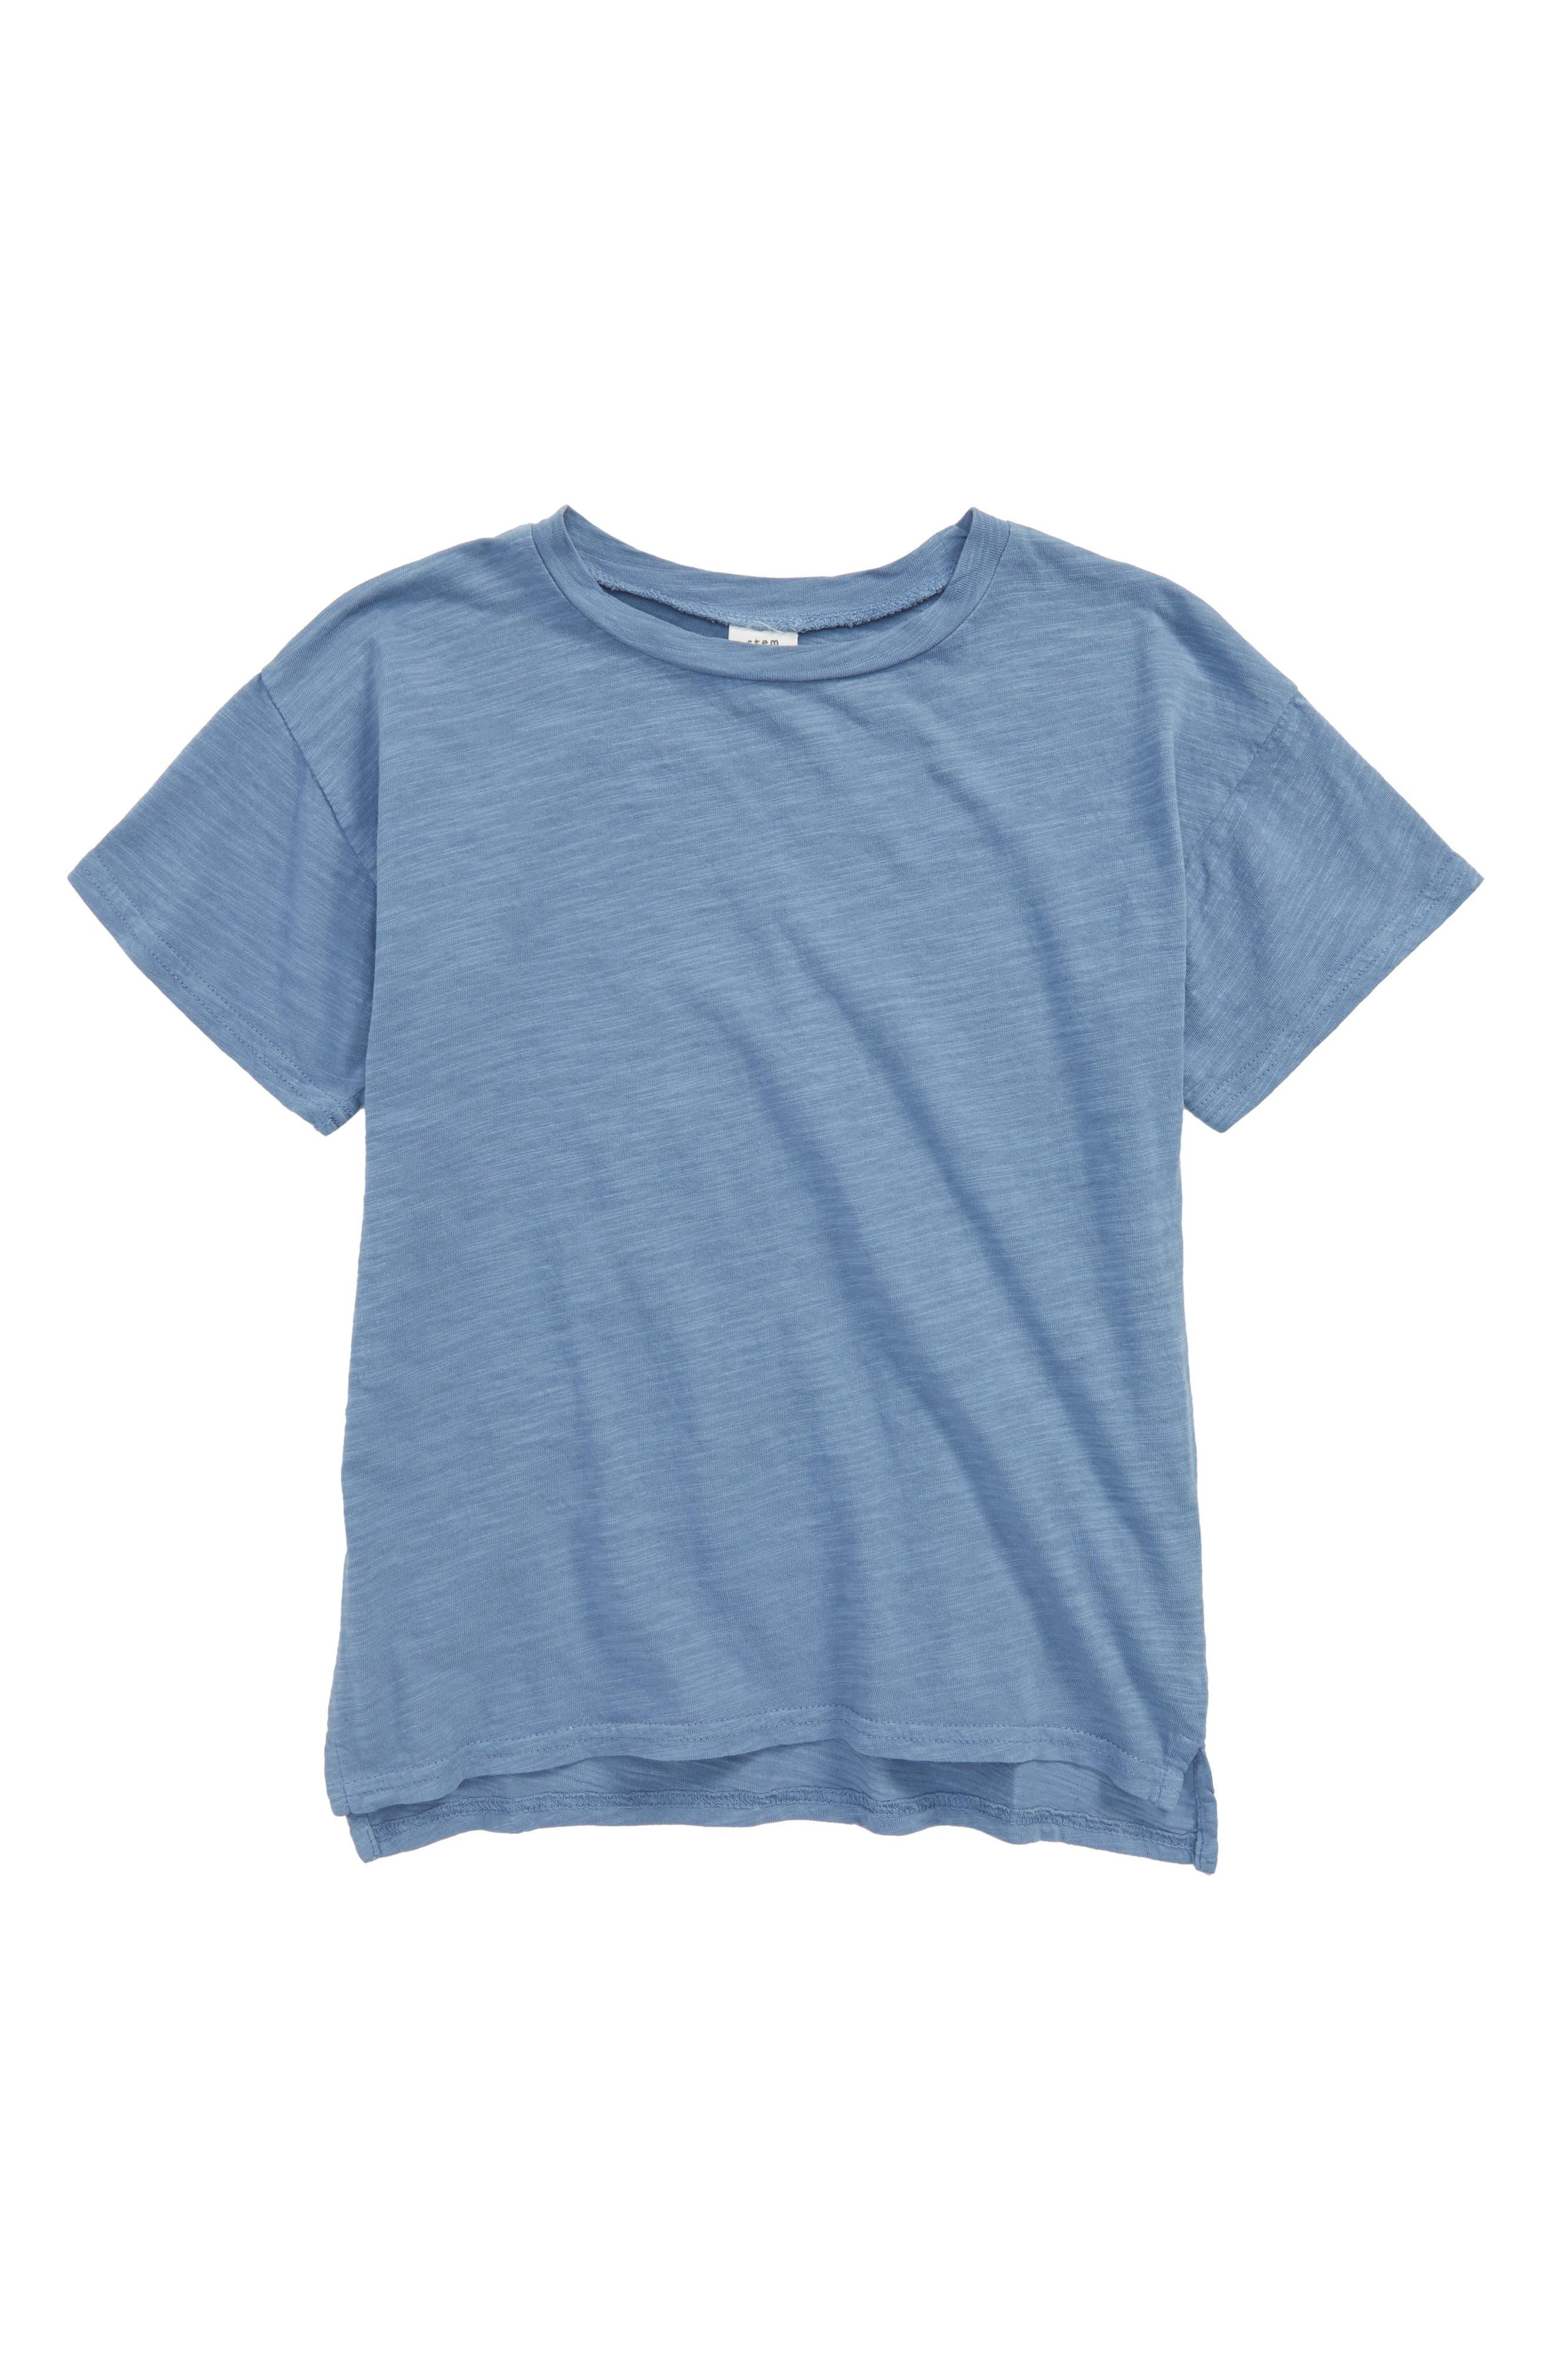 Short Sleeve Cotton T-Shirt,                             Main thumbnail 1, color,                             Blue Moonlight